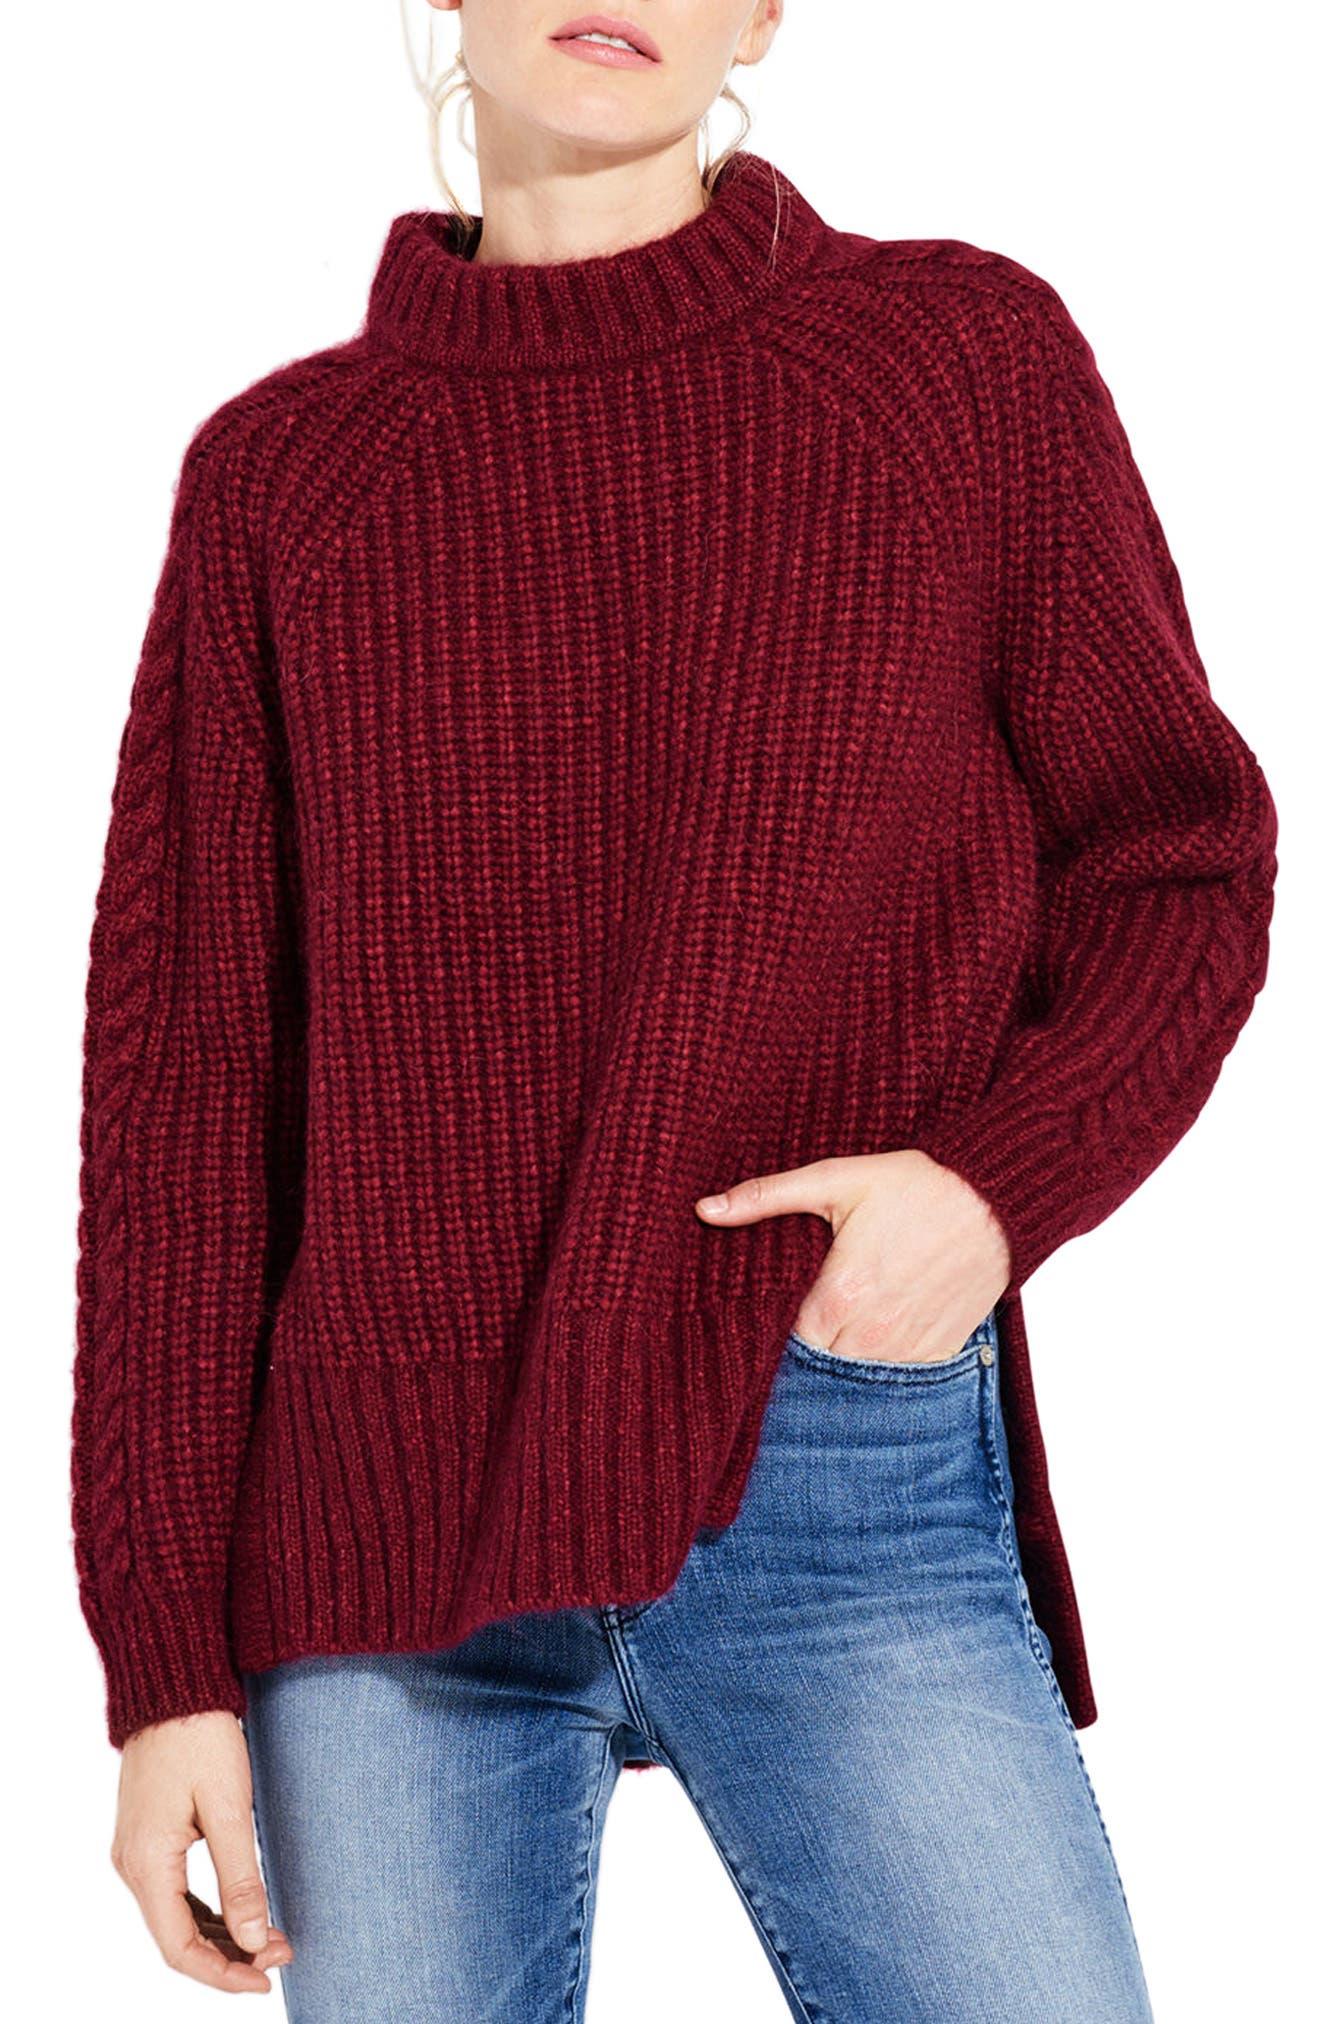 Alternate Image 1 Selected - AYR The Spark Mock Neck Sweater